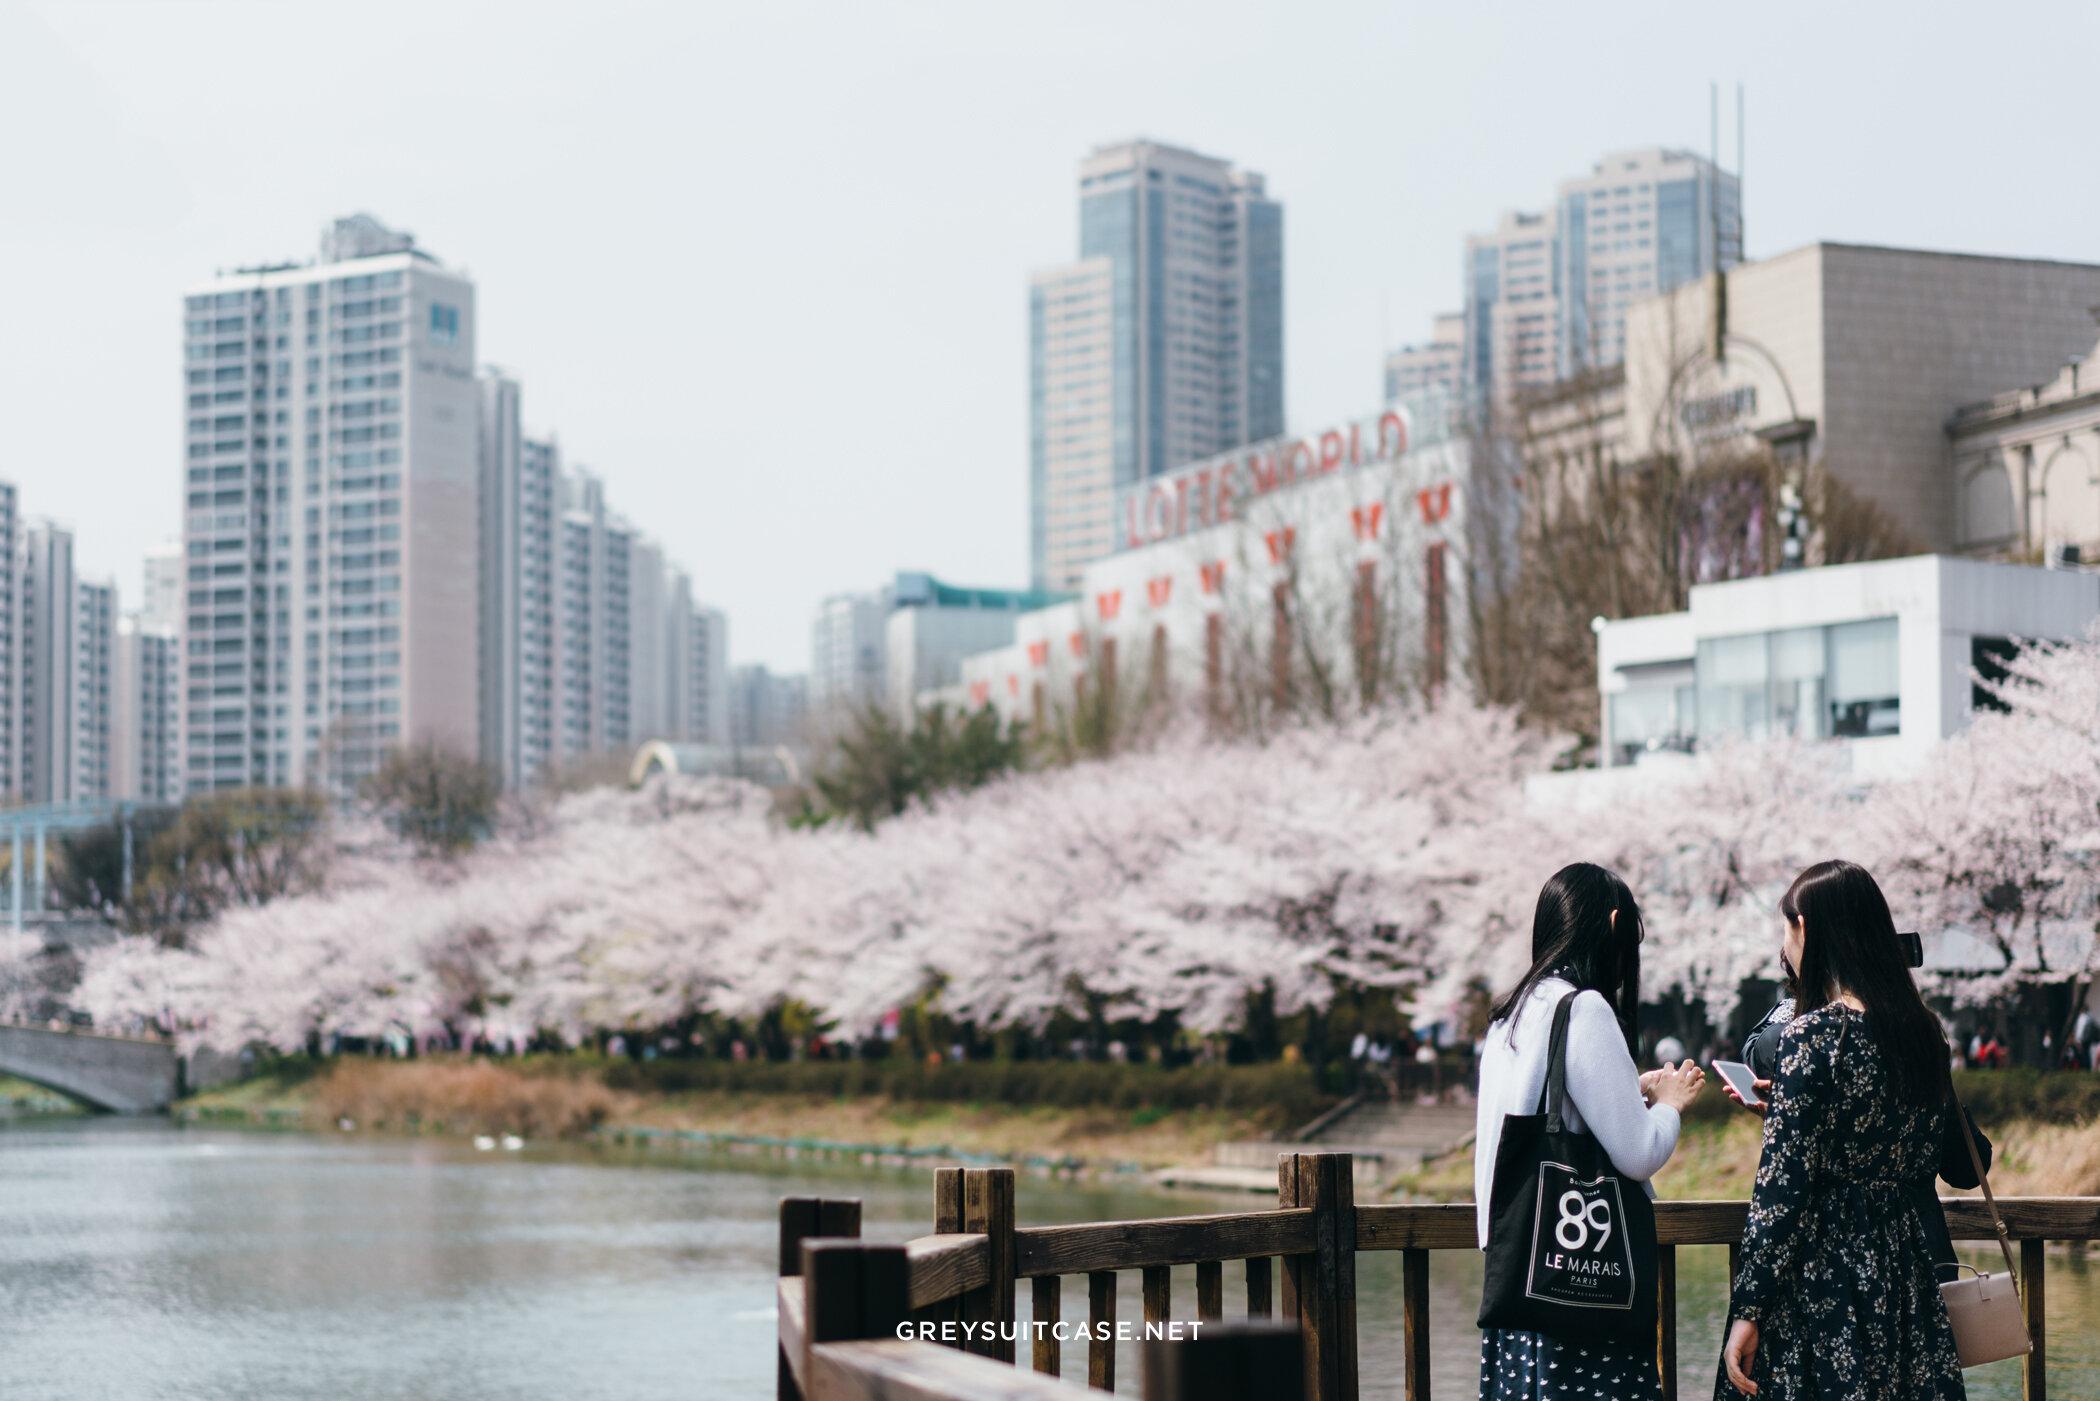 Greysuitcase Travel Series - Seoul Spring '17 - Cherry Blossom at Seokchon Lake (석촌호수공원), Seoul, South Korea.